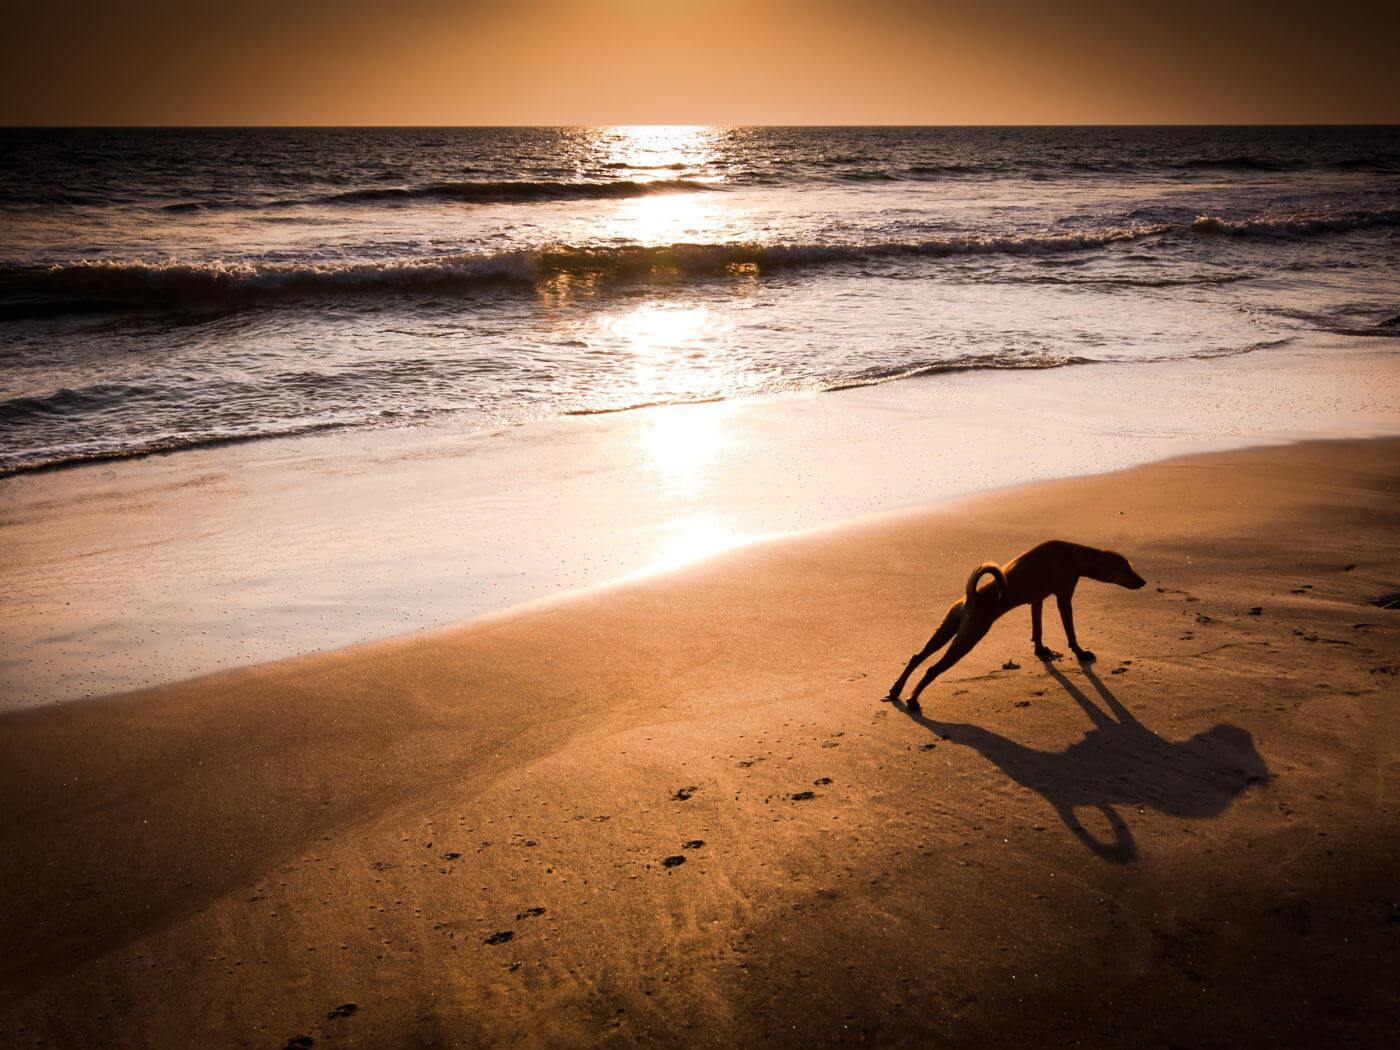 Concept idea of dog yoga. Dog in yoga position Urdhva Mukha Svanasana (Upward Facing Dog) at tropical beach under evening sun. India